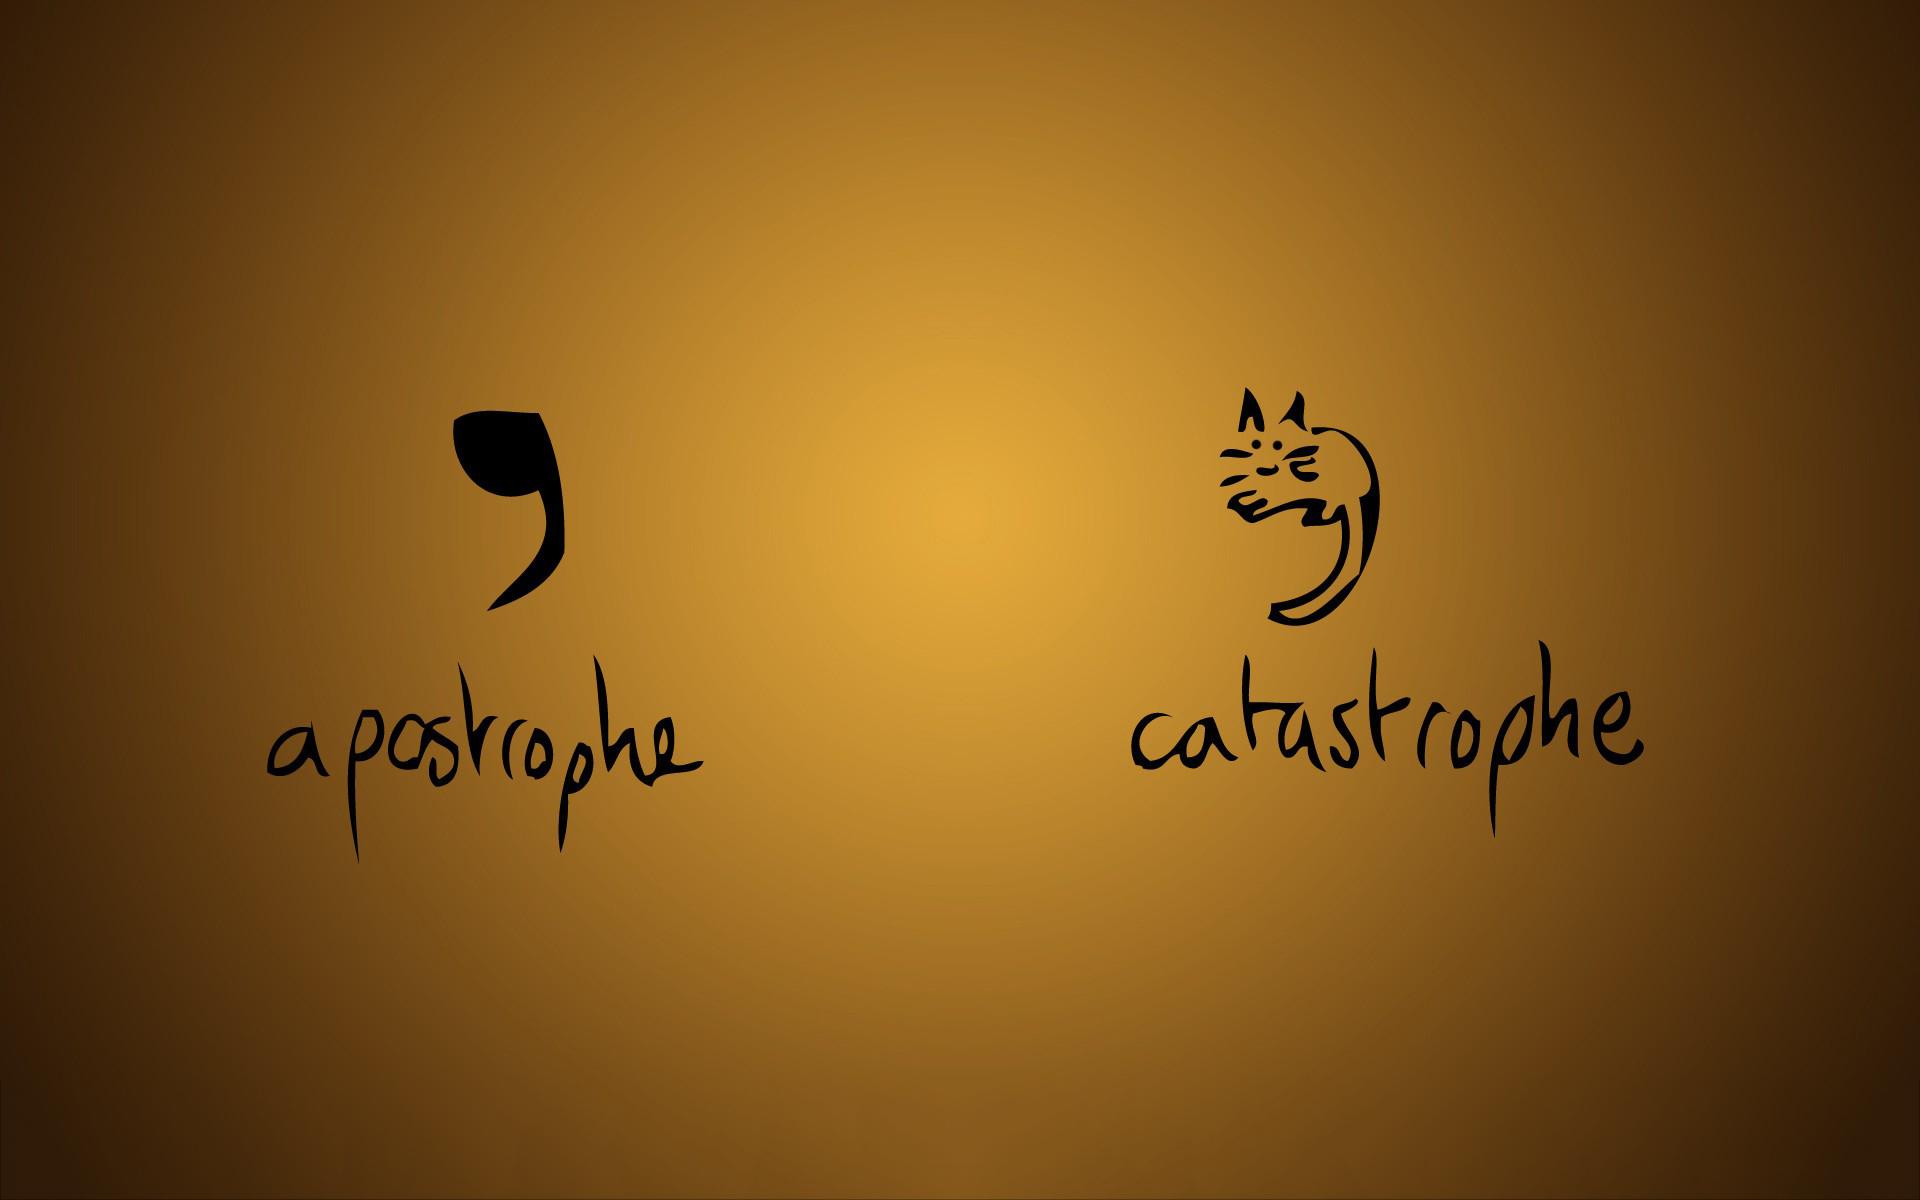 Apostrophe catastrophe 6996204 1920x1200